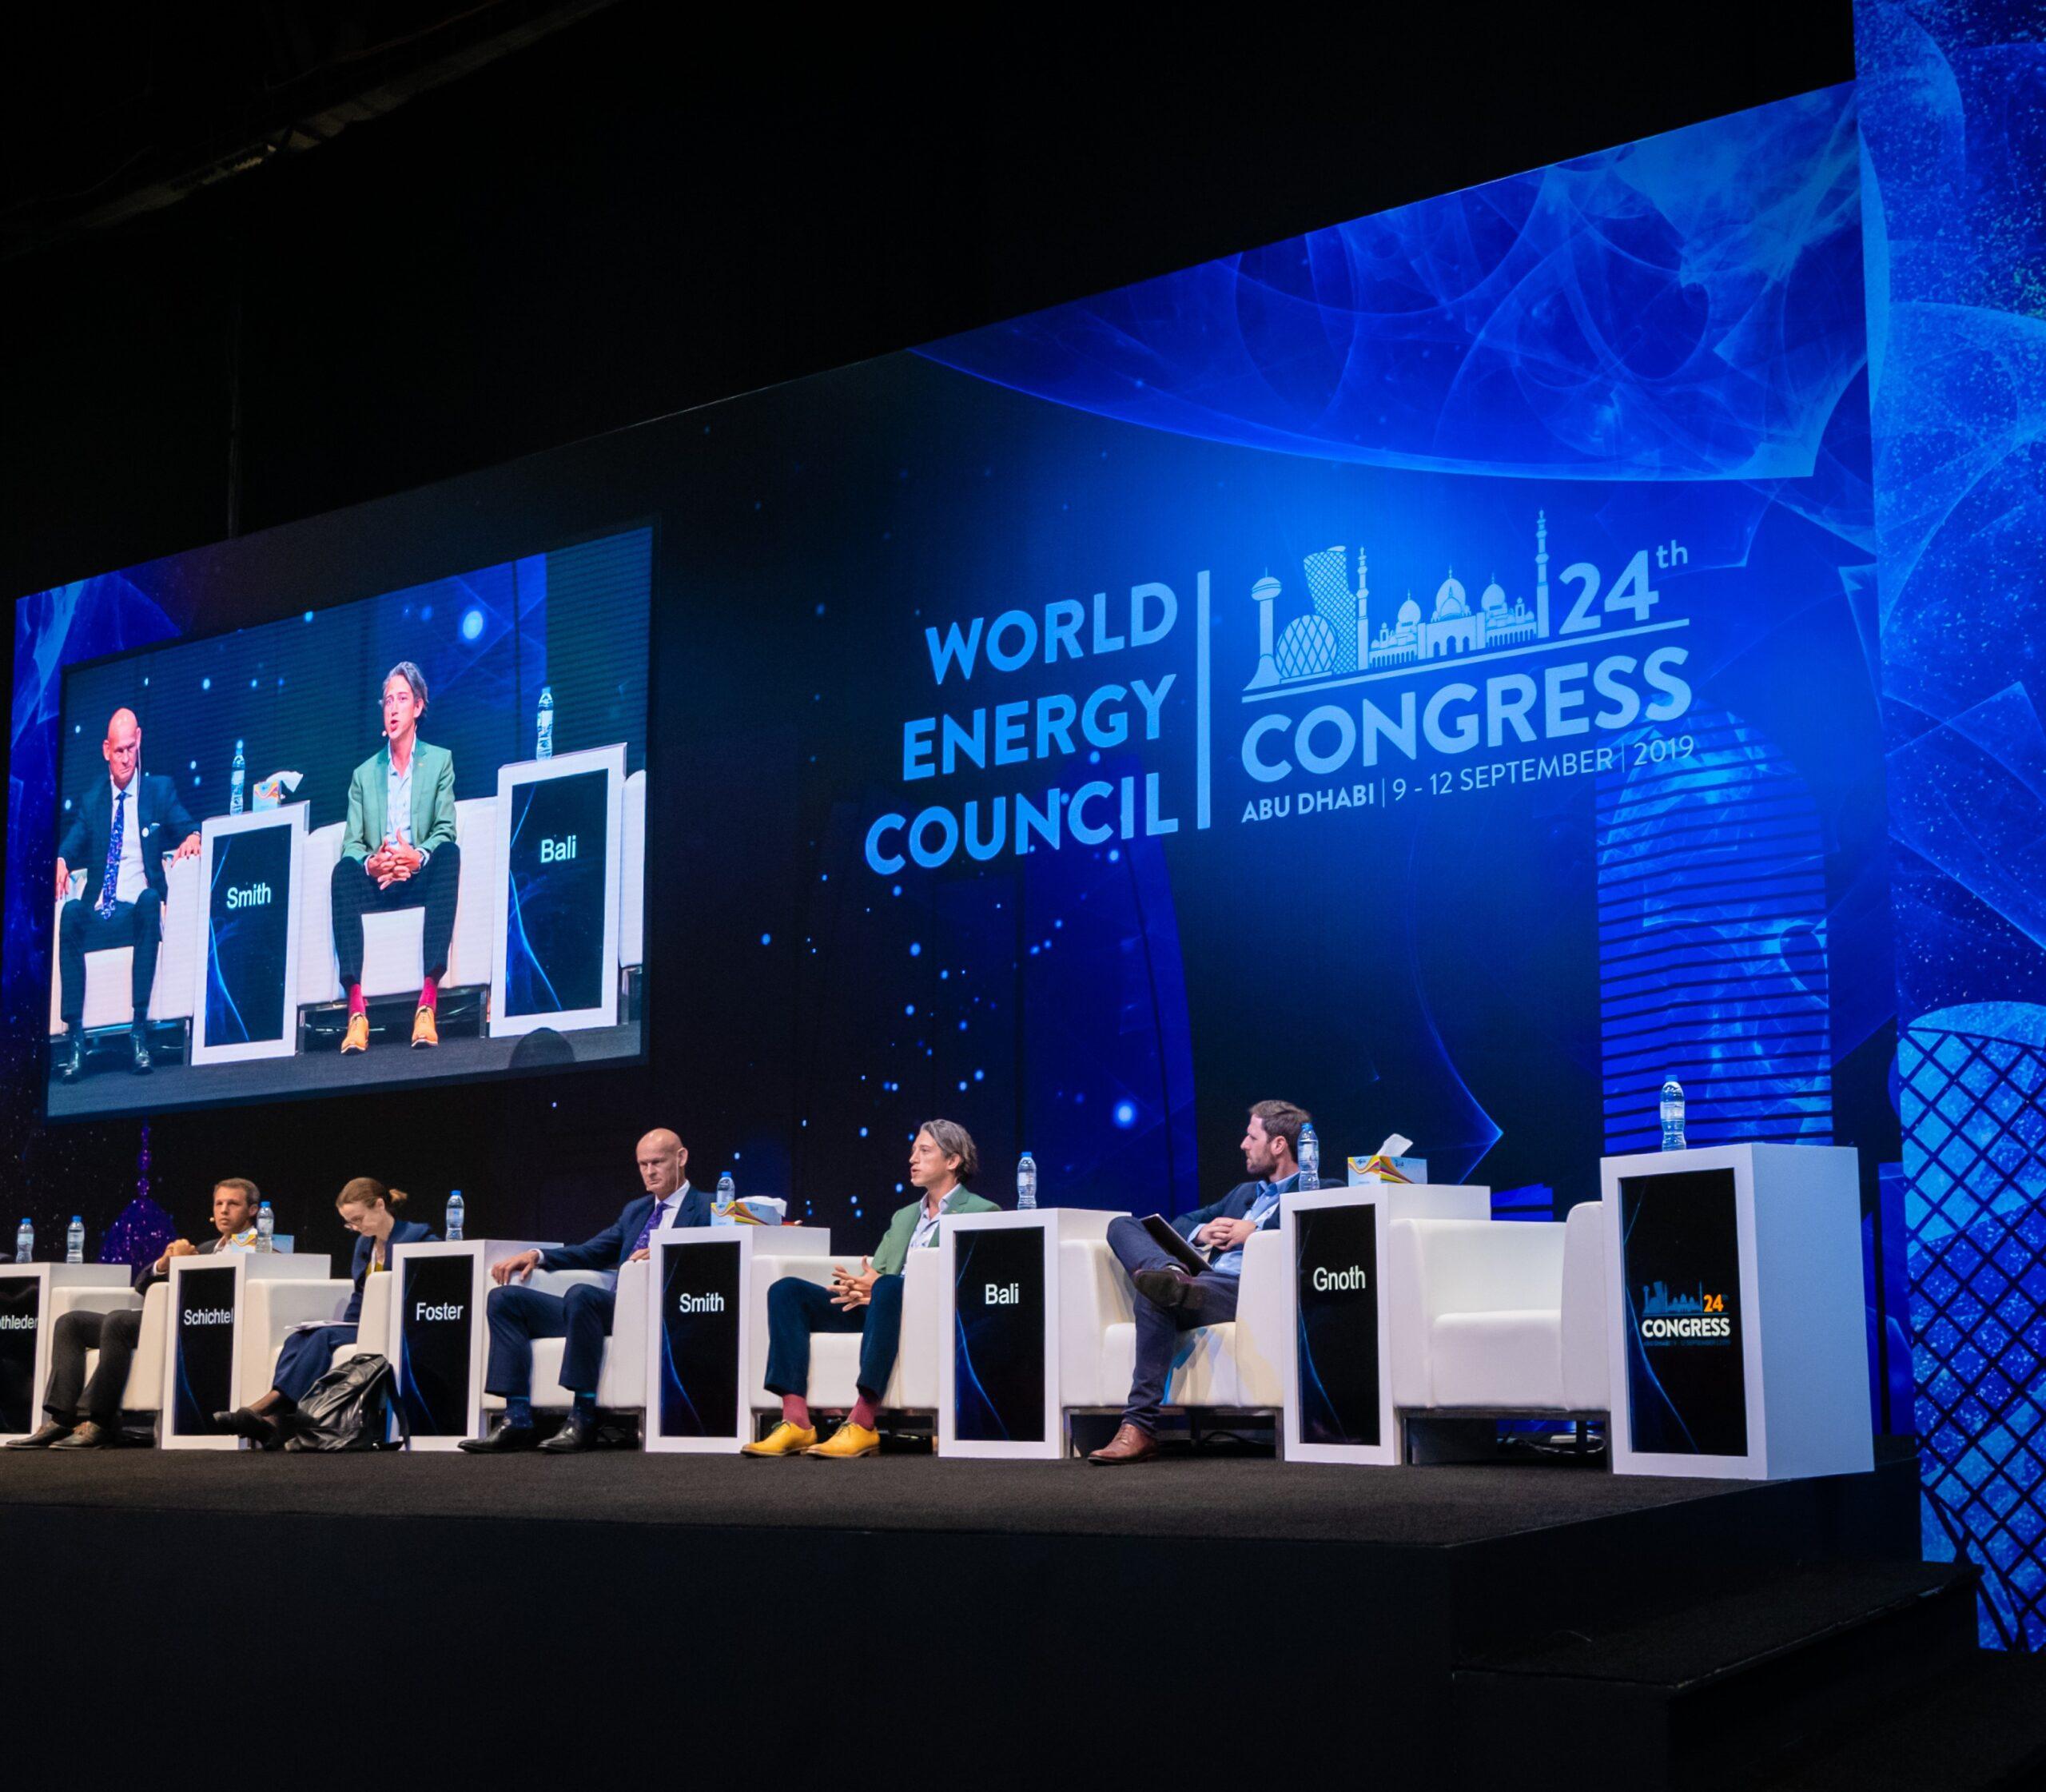 Hassen Bali • 24th World Energy Congress